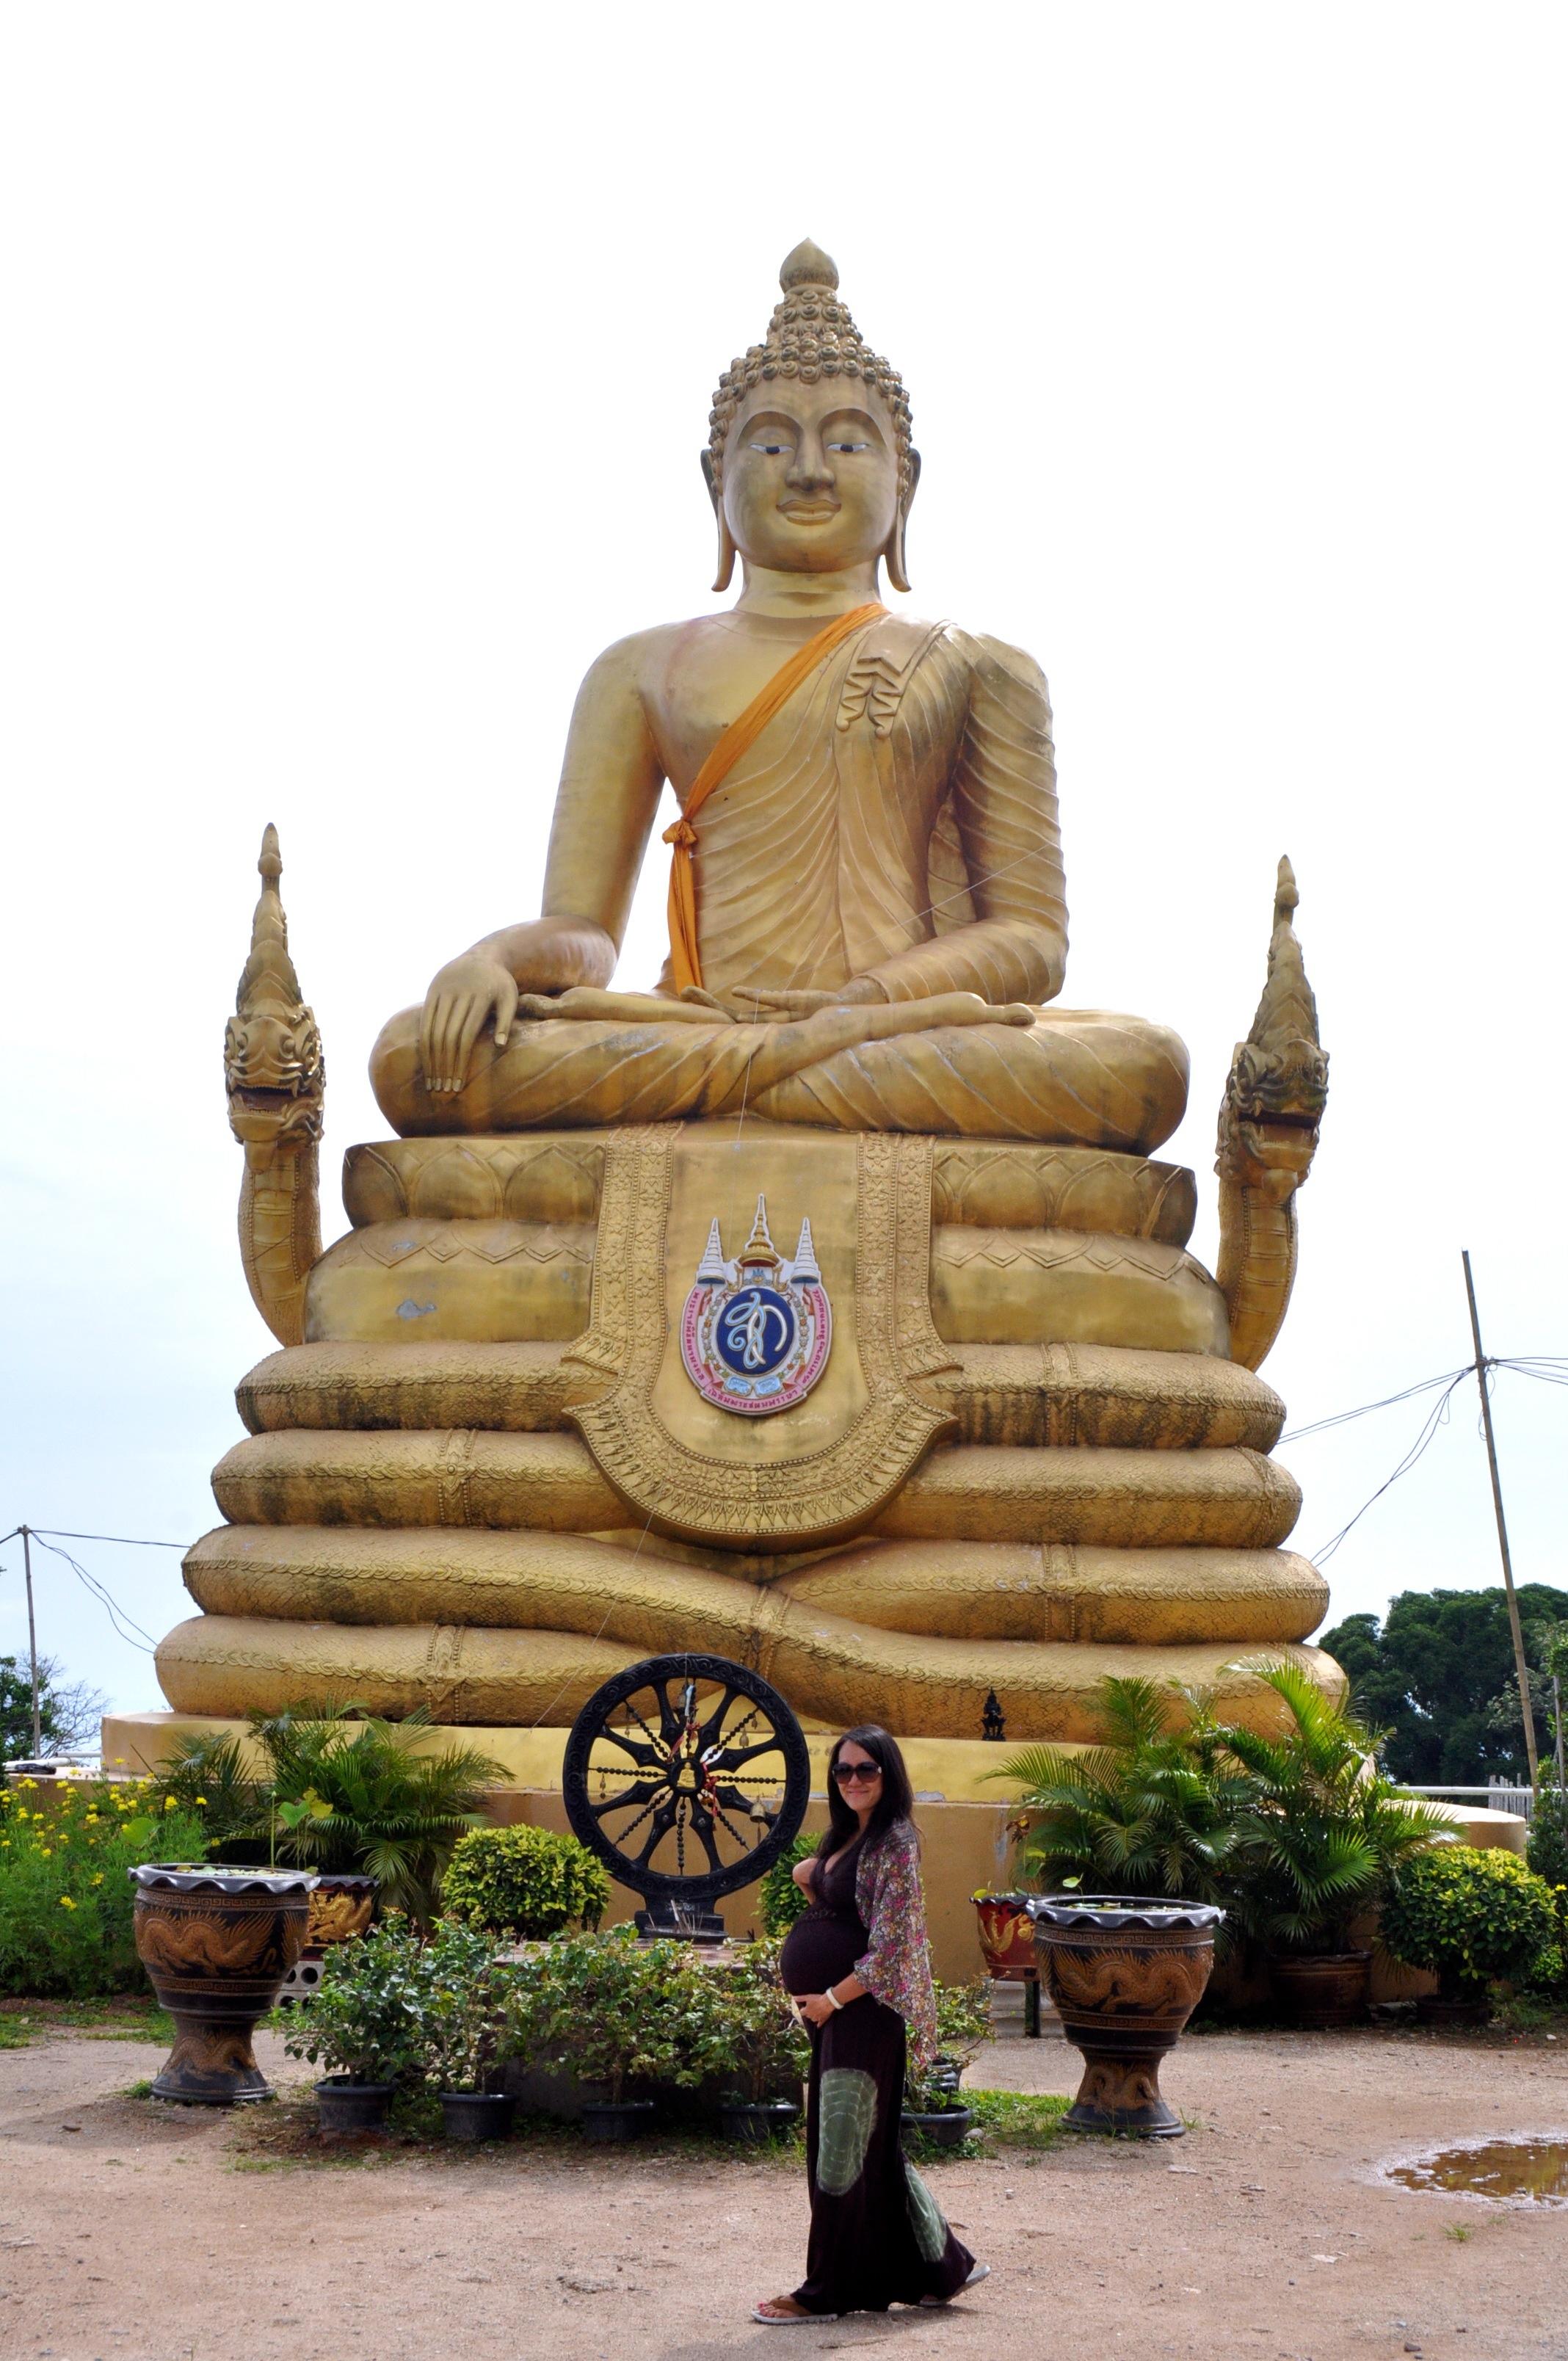 near the Big Buddha Phuket